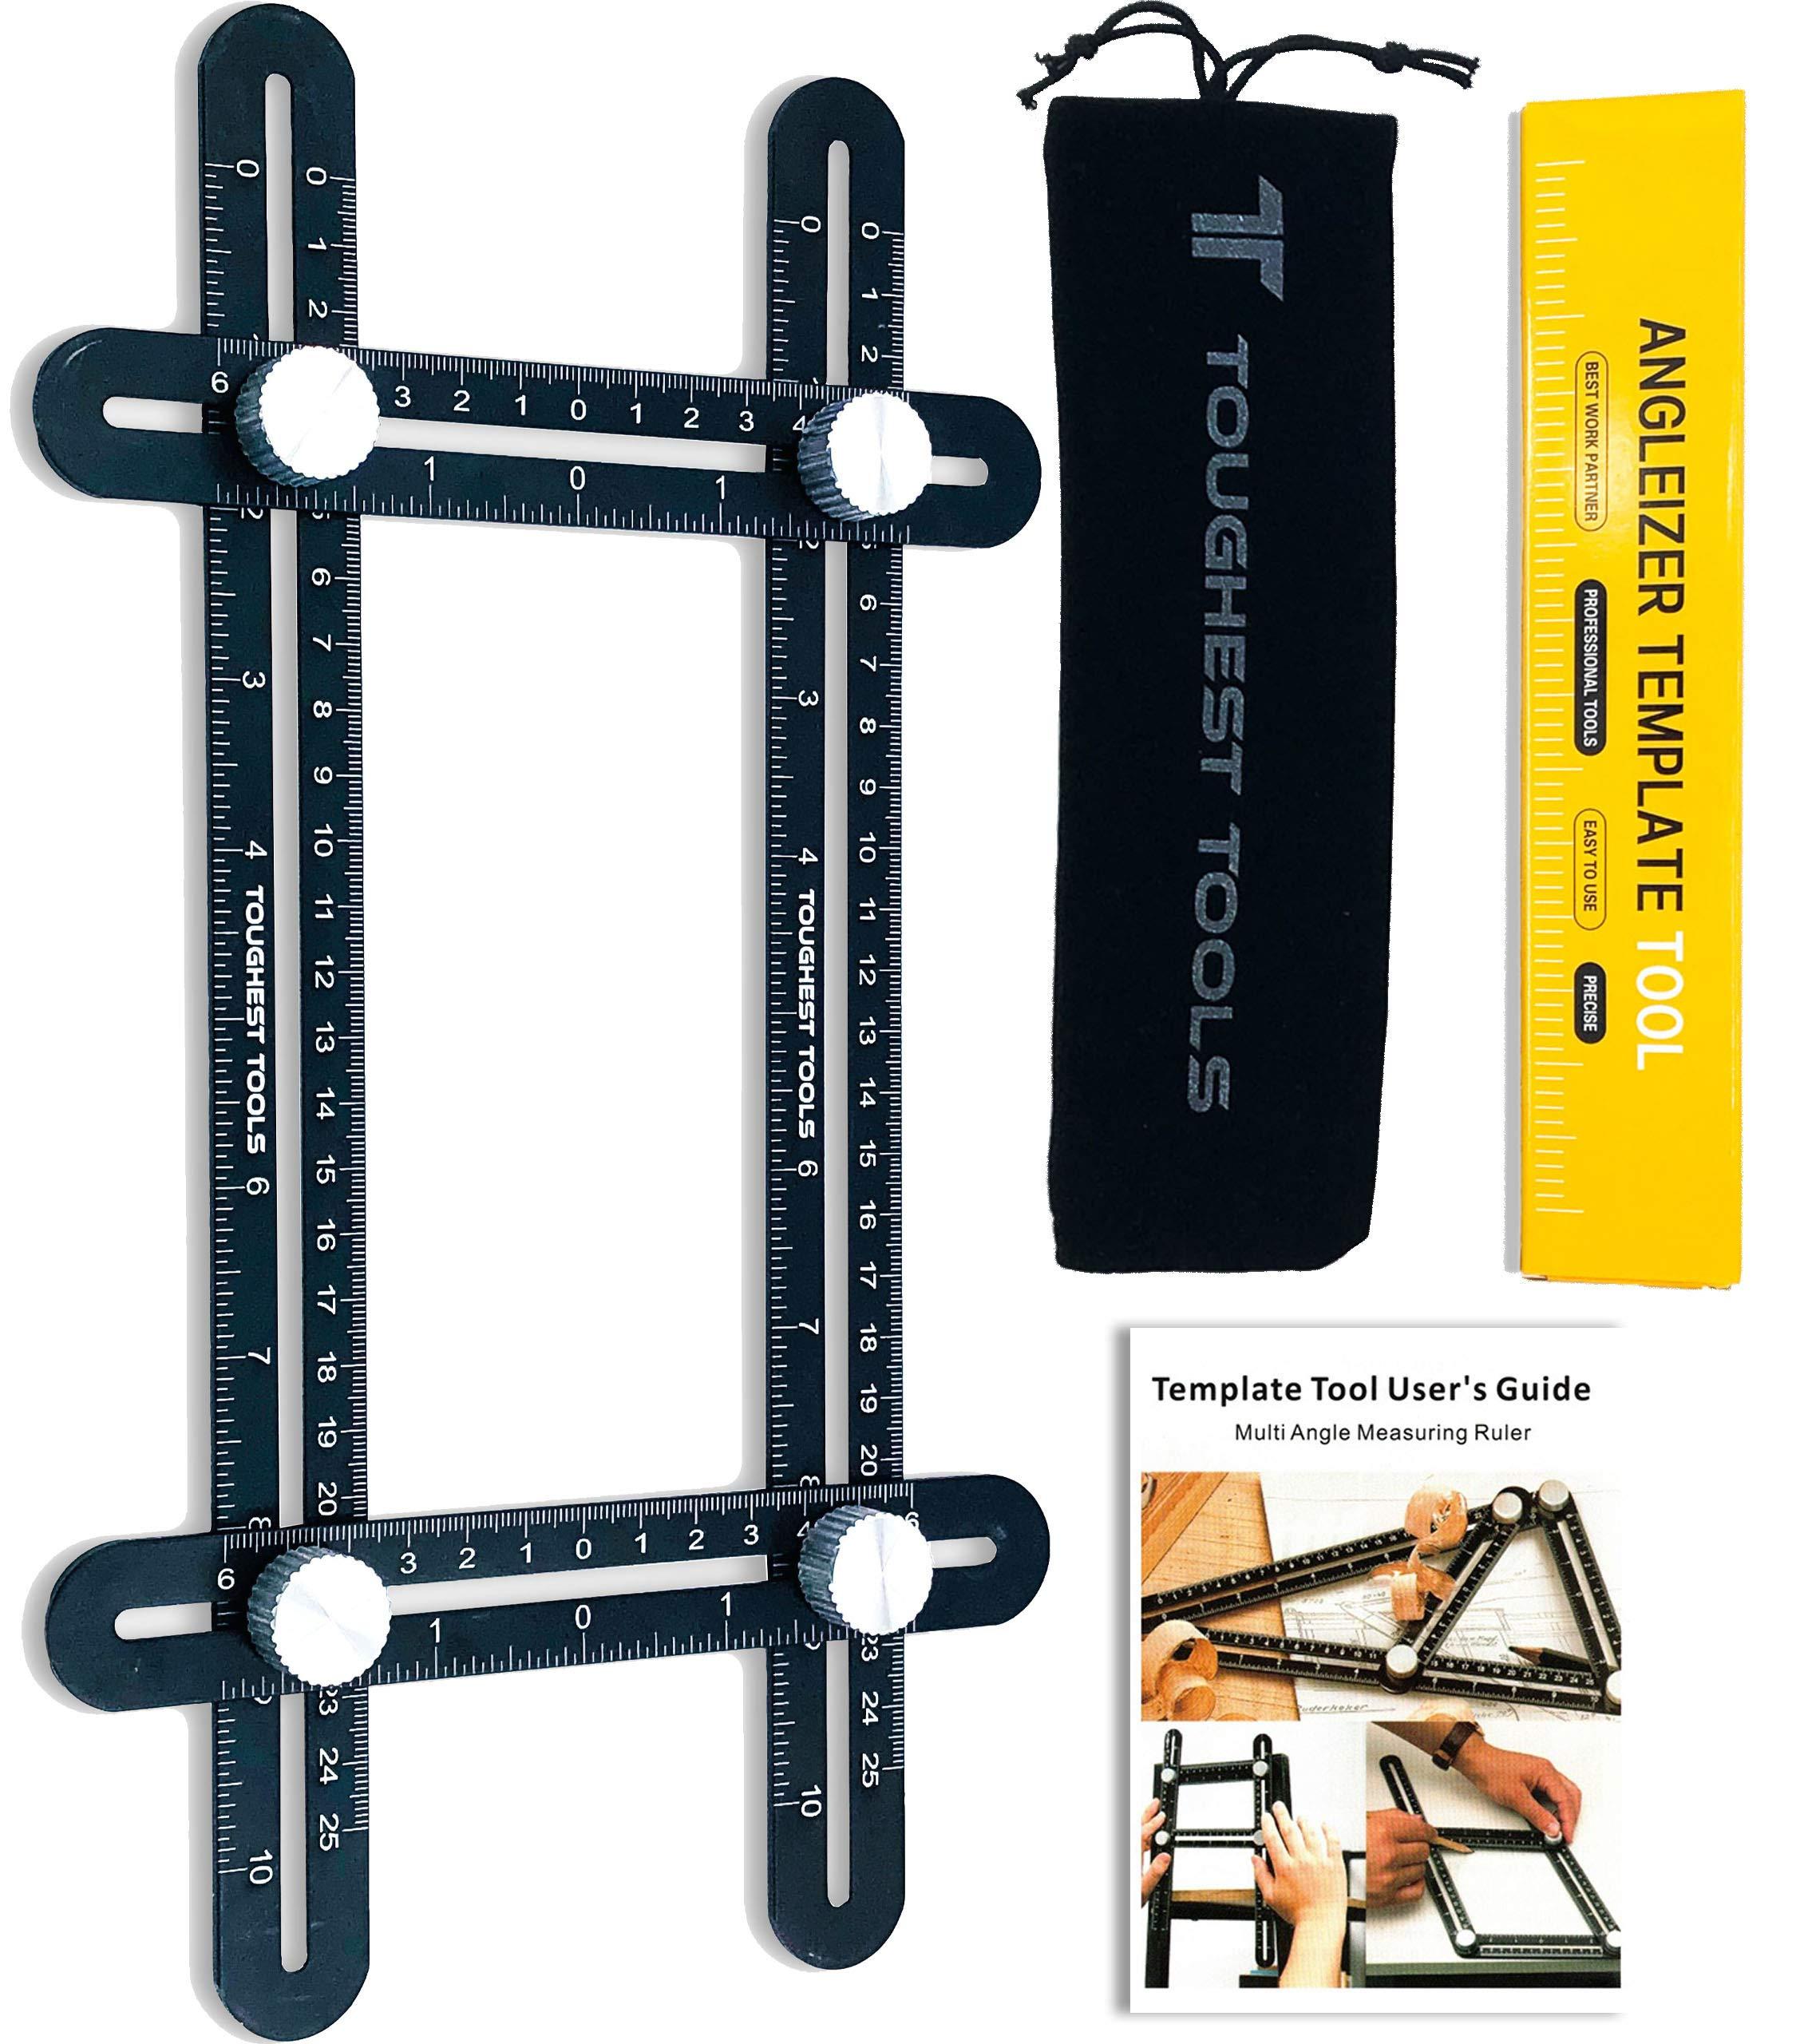 Angle ruler universal angler ruler multi function template measurement tool woodworking tools and accessories aluminum metal ruler multi angle measuring ruler tools for men